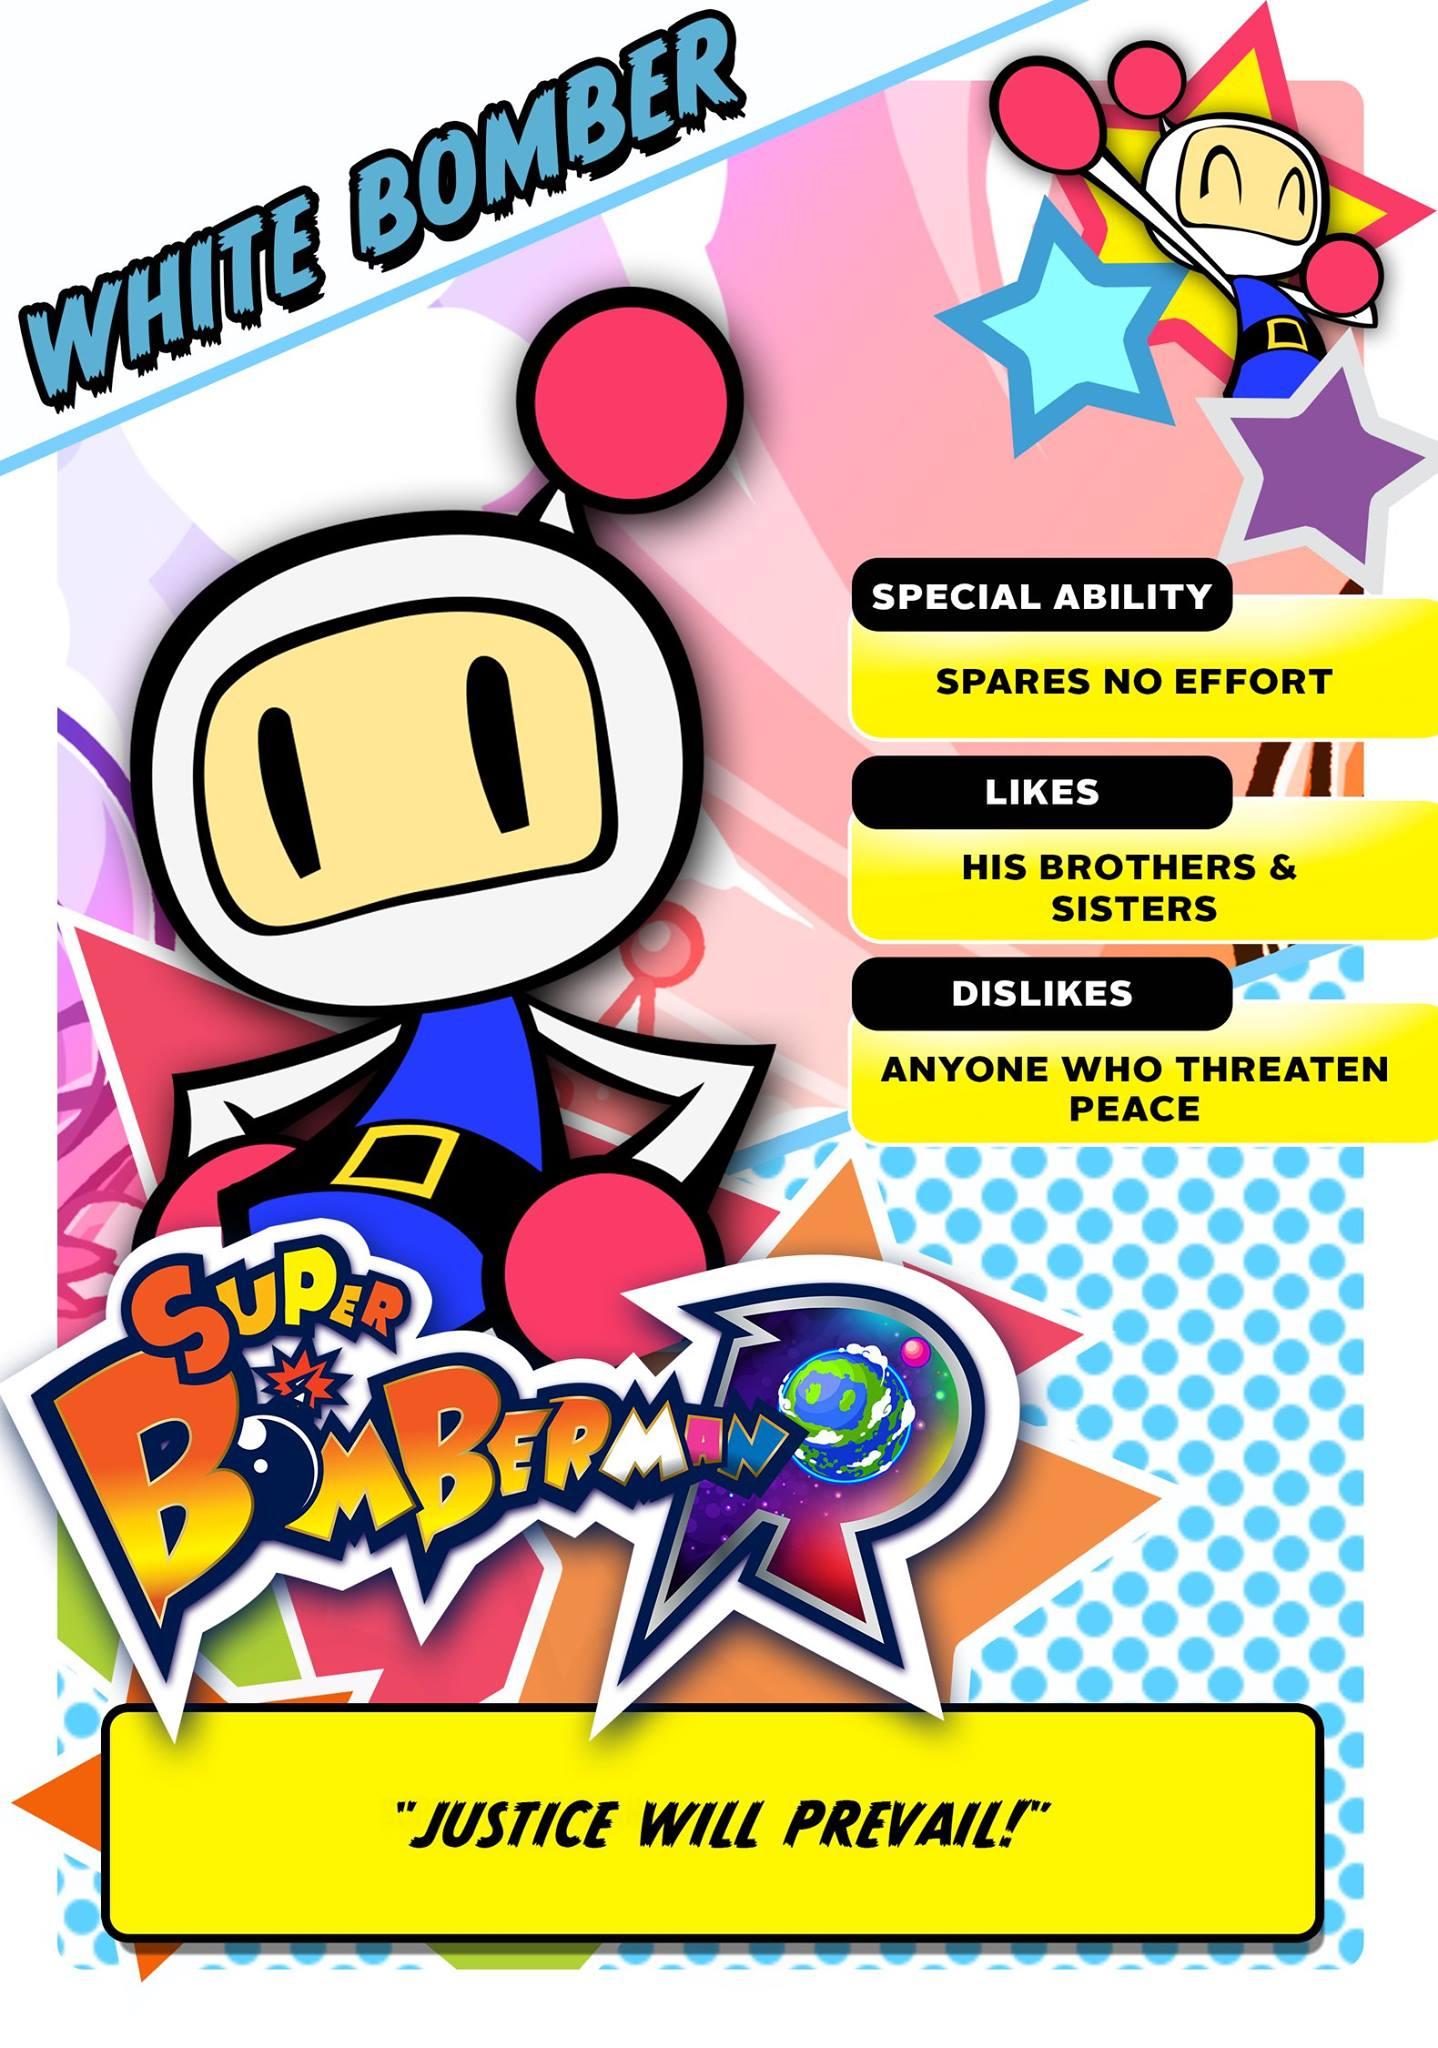 Bomberman-White